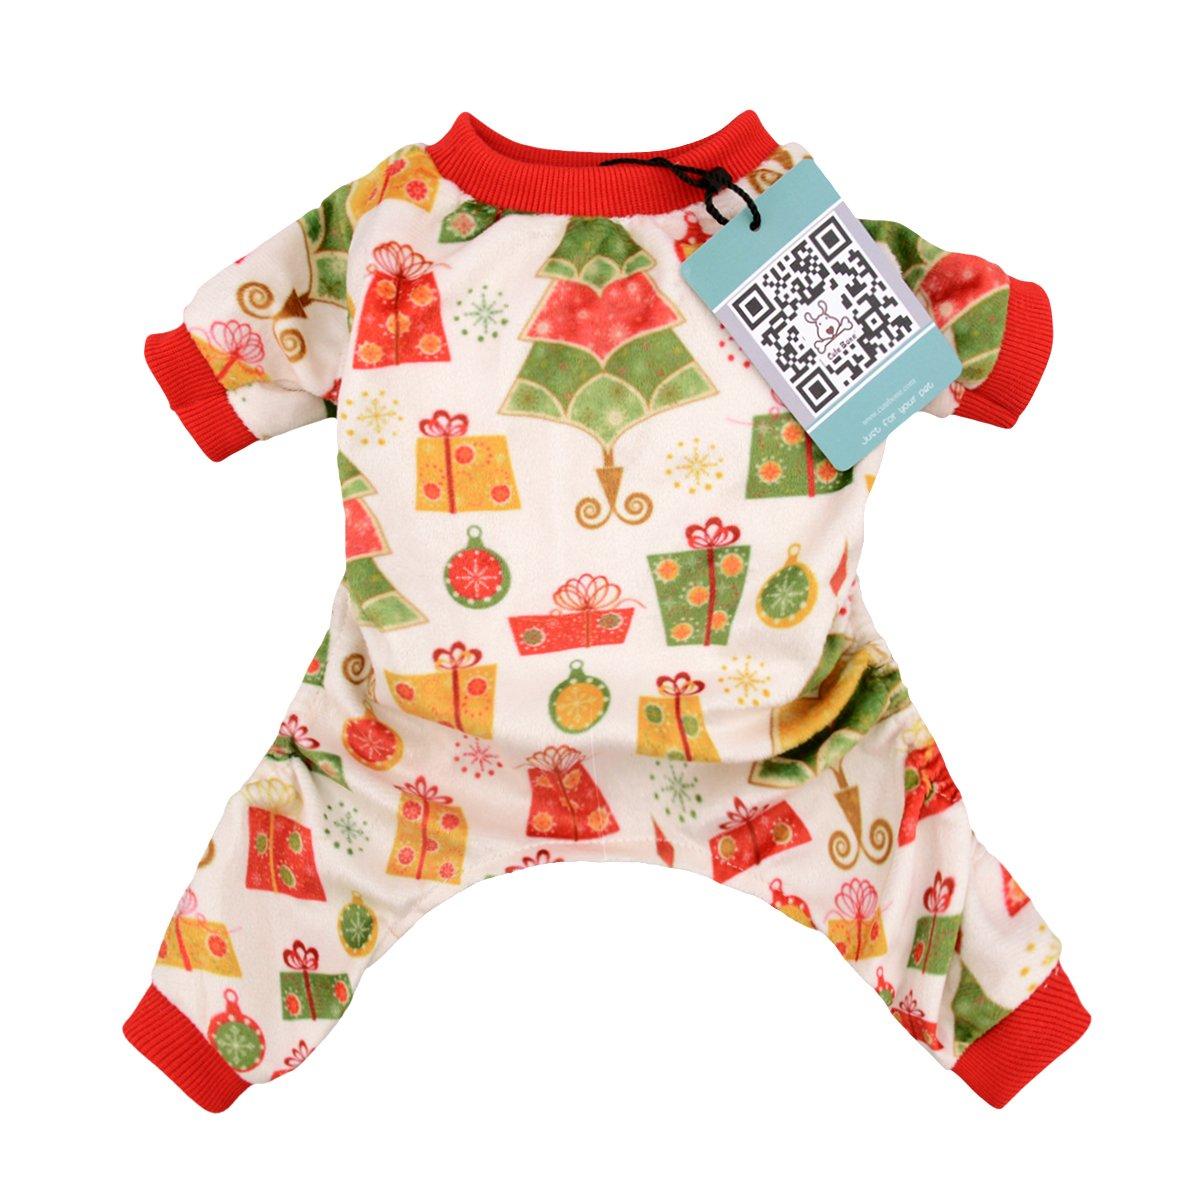 CuteBone Dog Pajamas Christmas tree Dog Apparel Dog Jumpsuit Pet Clothes Pajamas P17L by CuteBone (Image #1)